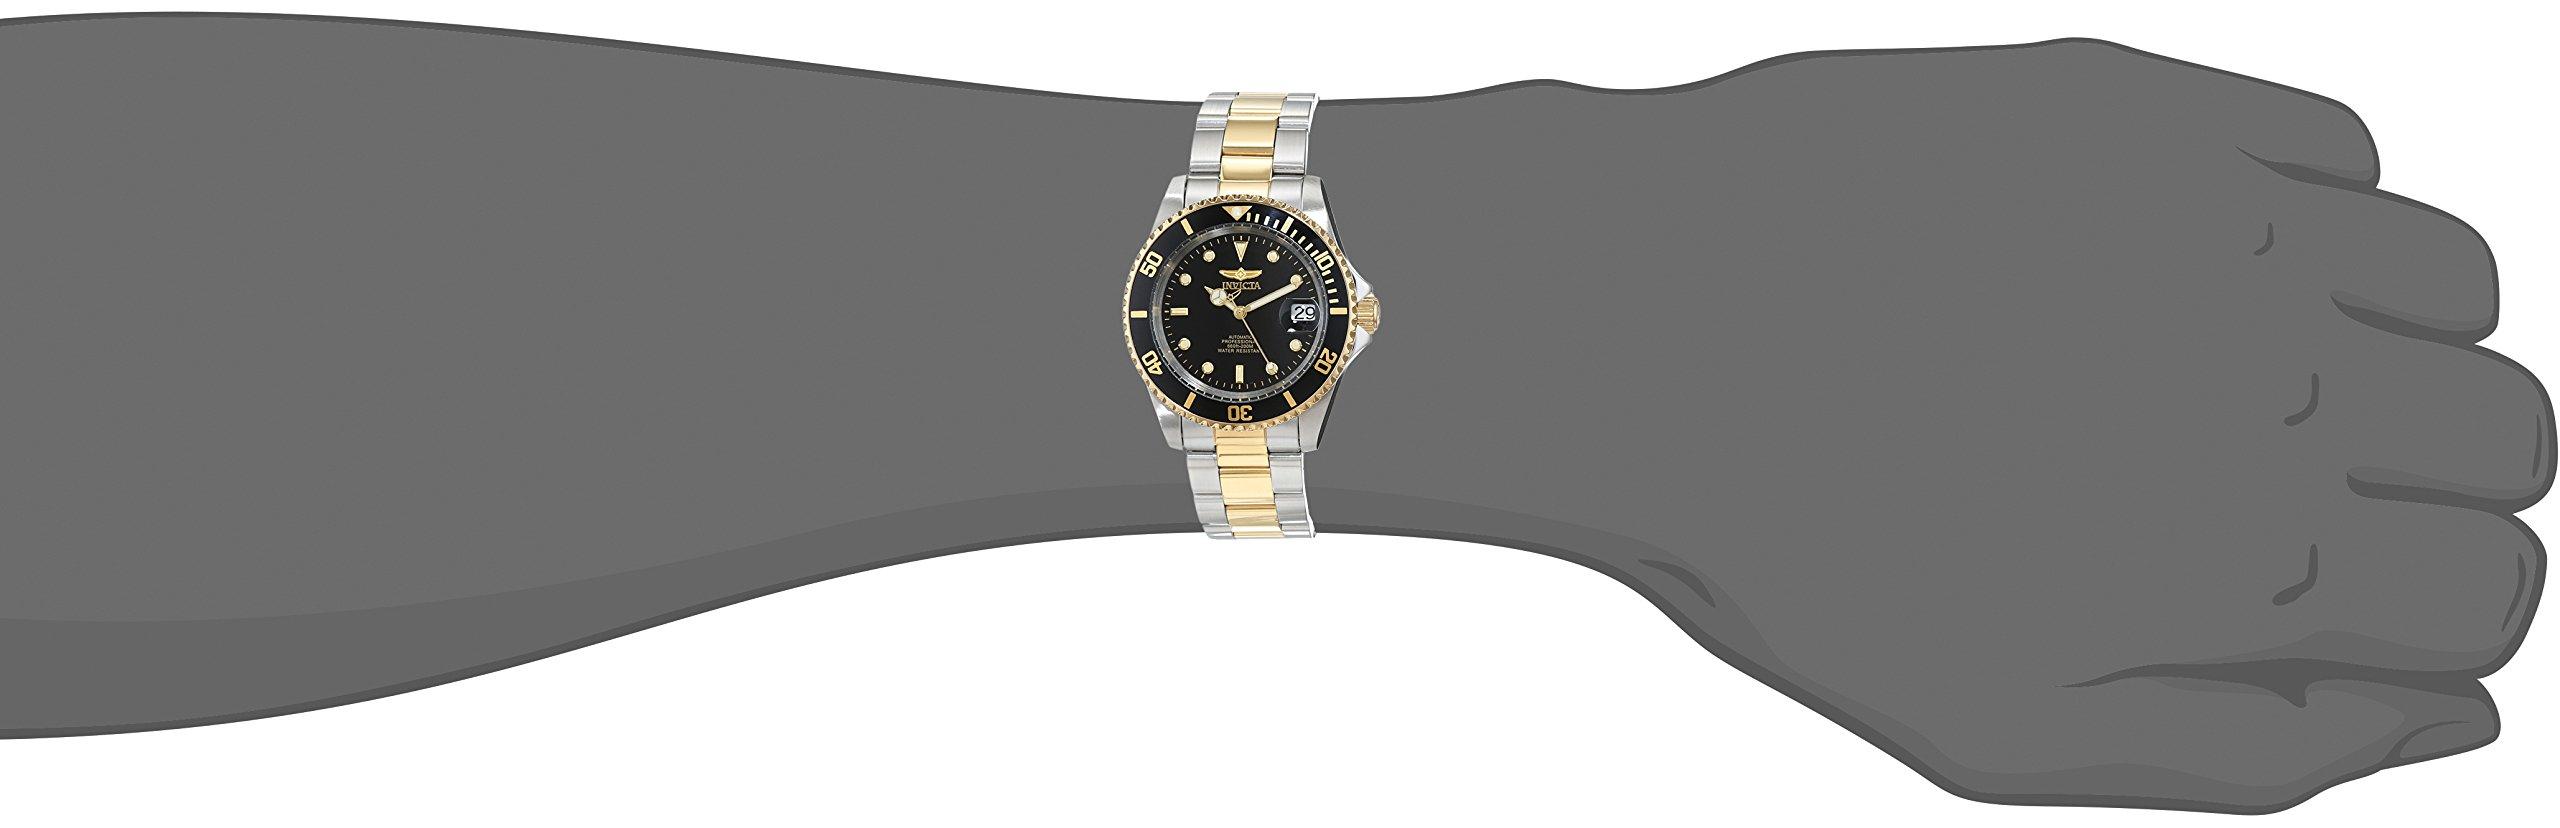 Invicta Pro-Diver Analog Black Dial Men's Watch-8927OB